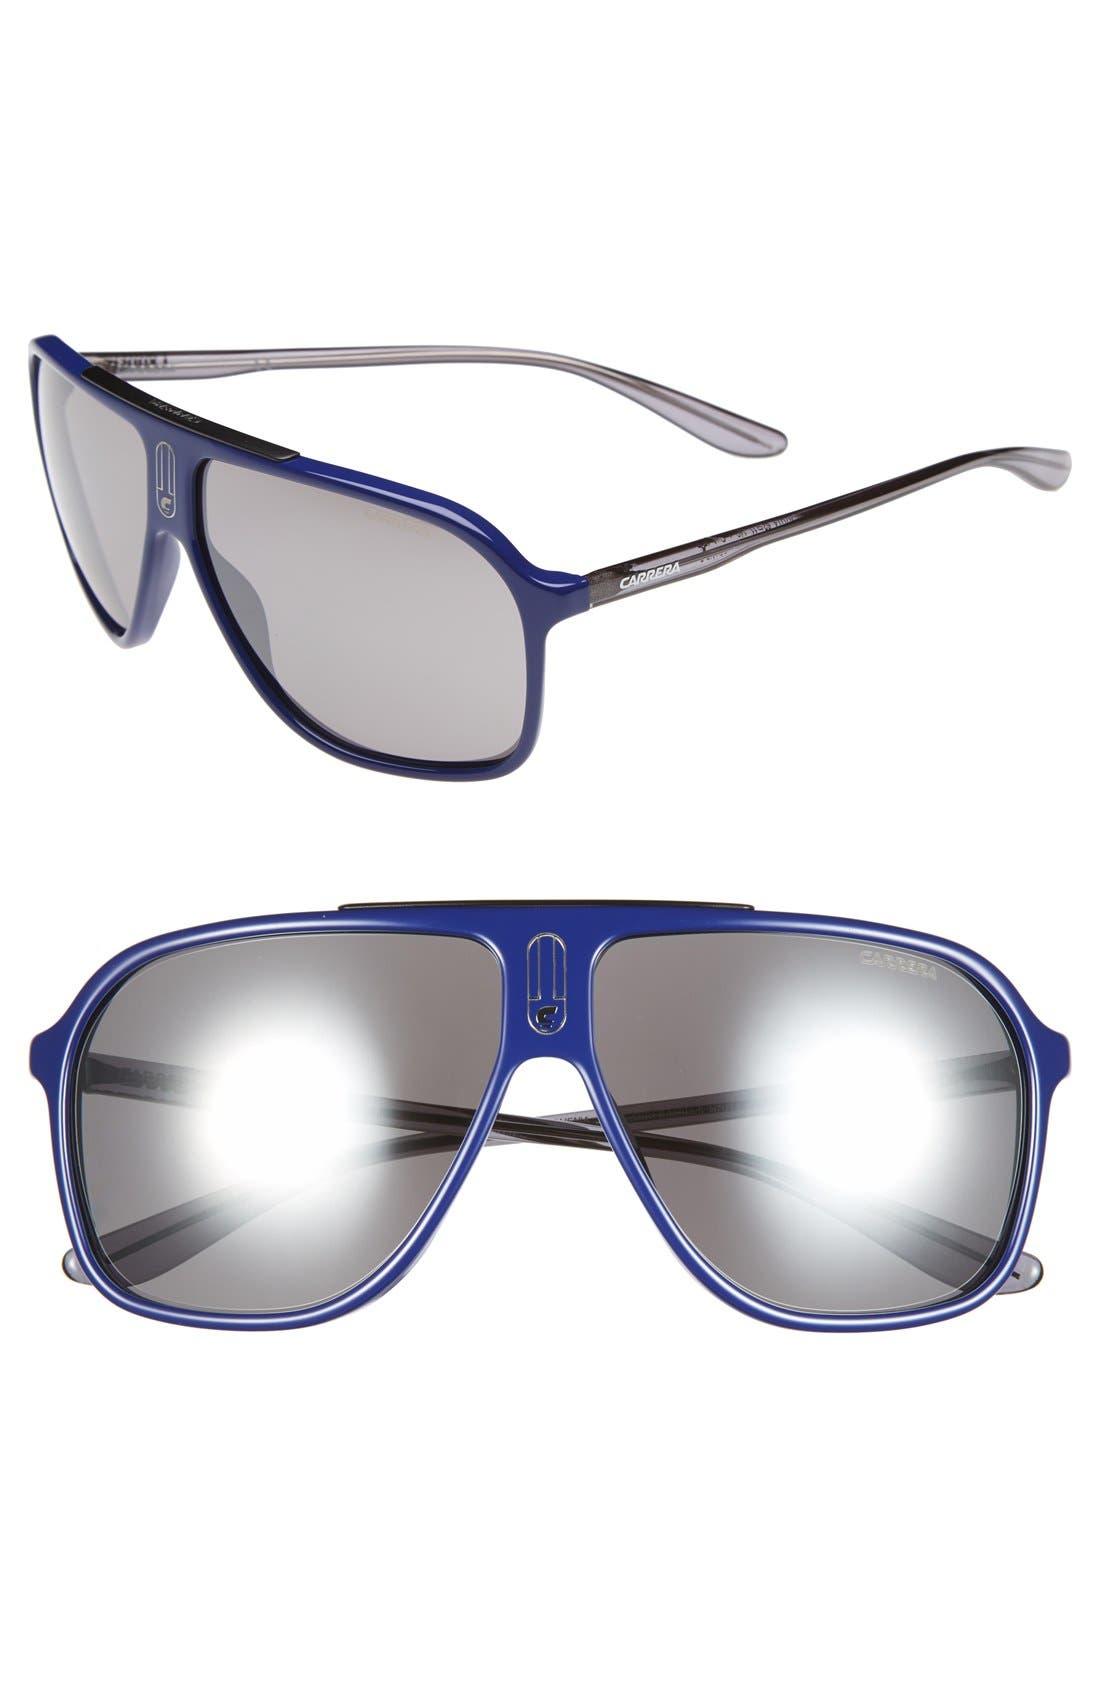 62mm Sunglasses,                             Main thumbnail 3, color,